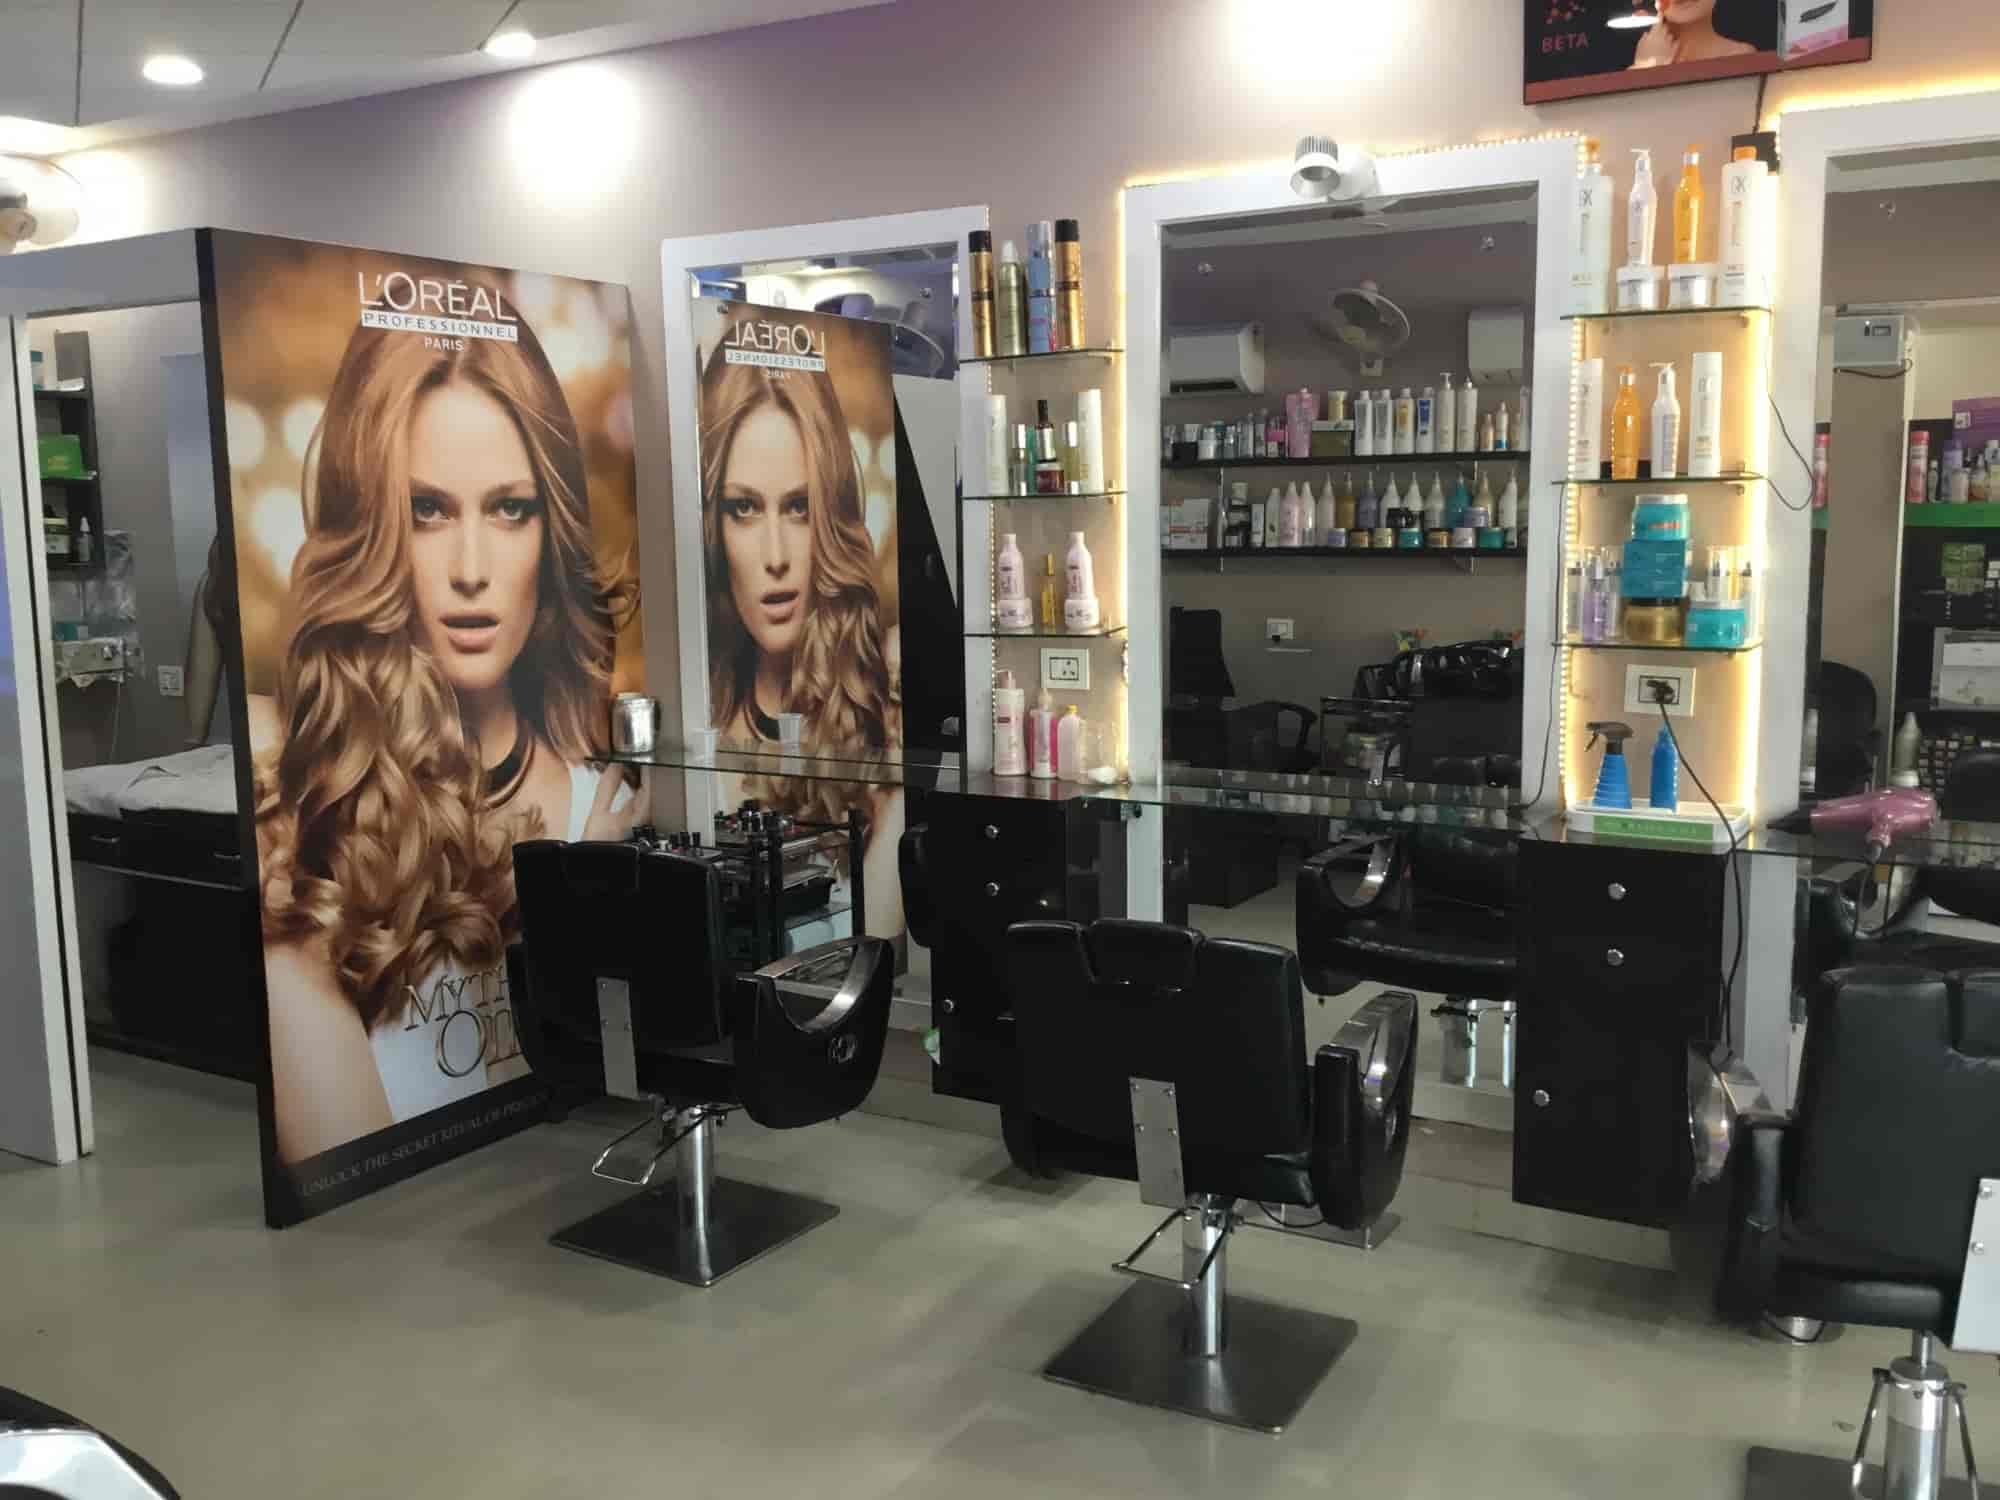 lucky's unisex salon., east of kailash - beauty spas in delhi - justdial